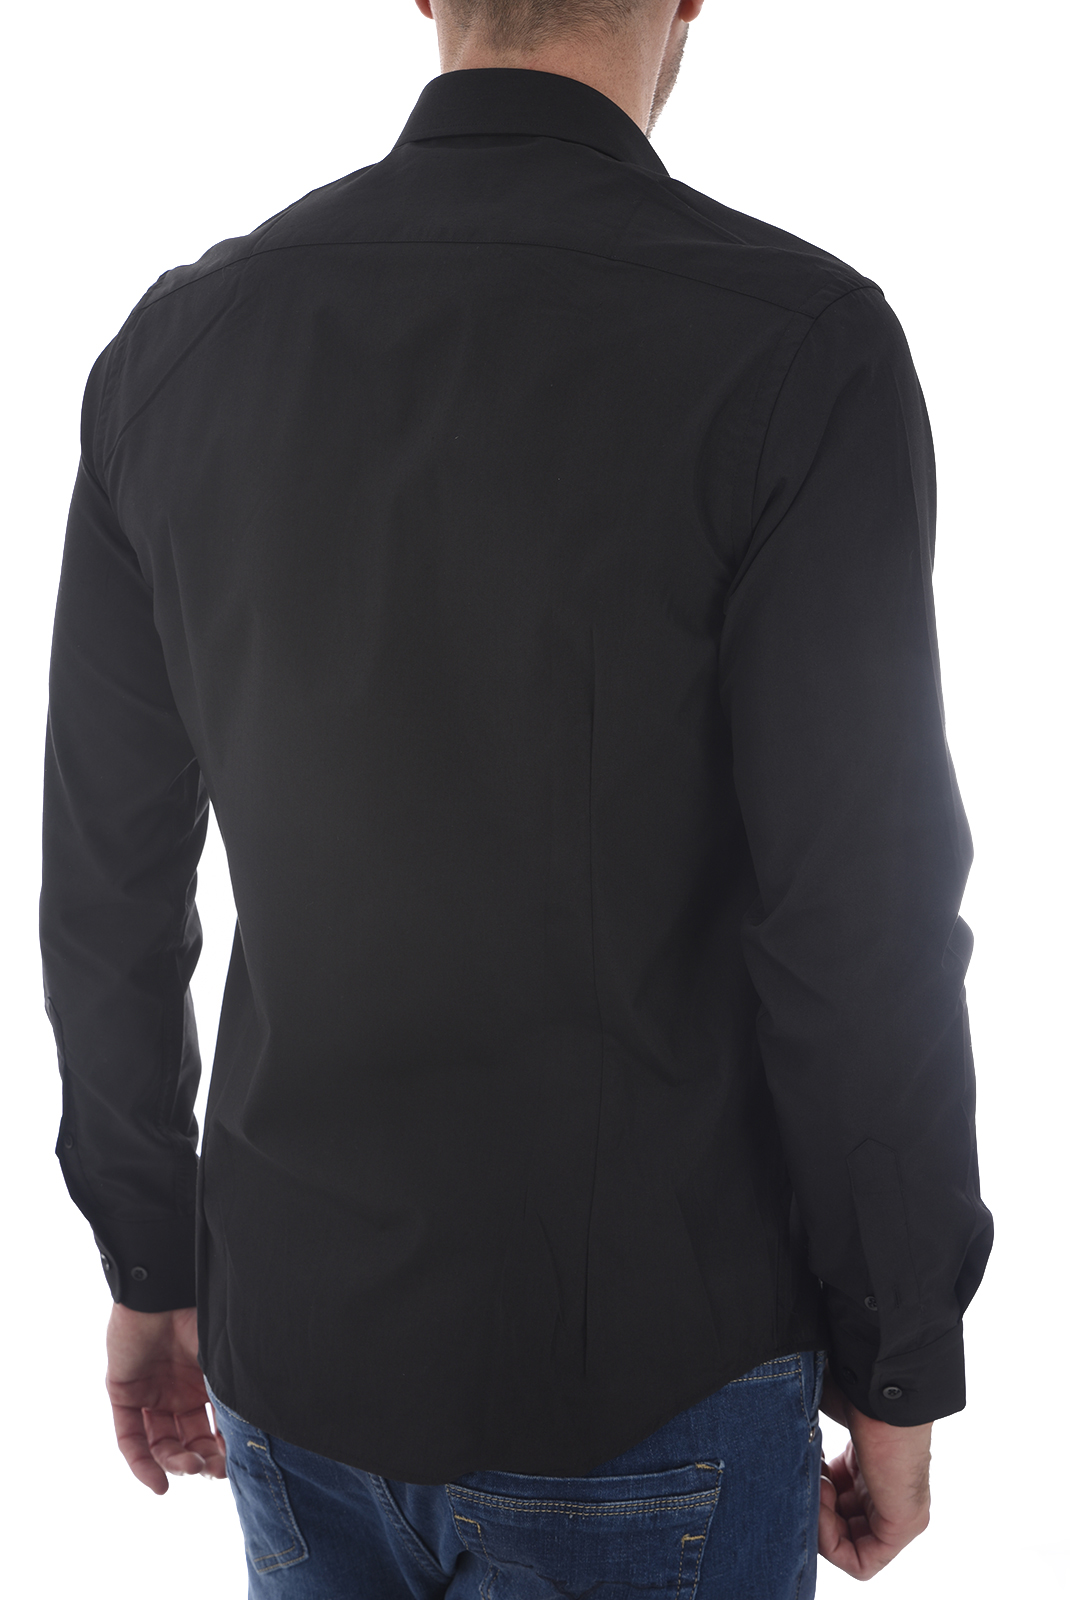 Chemises manches longues  19V69 by Versace 1969 SATIN NOIR